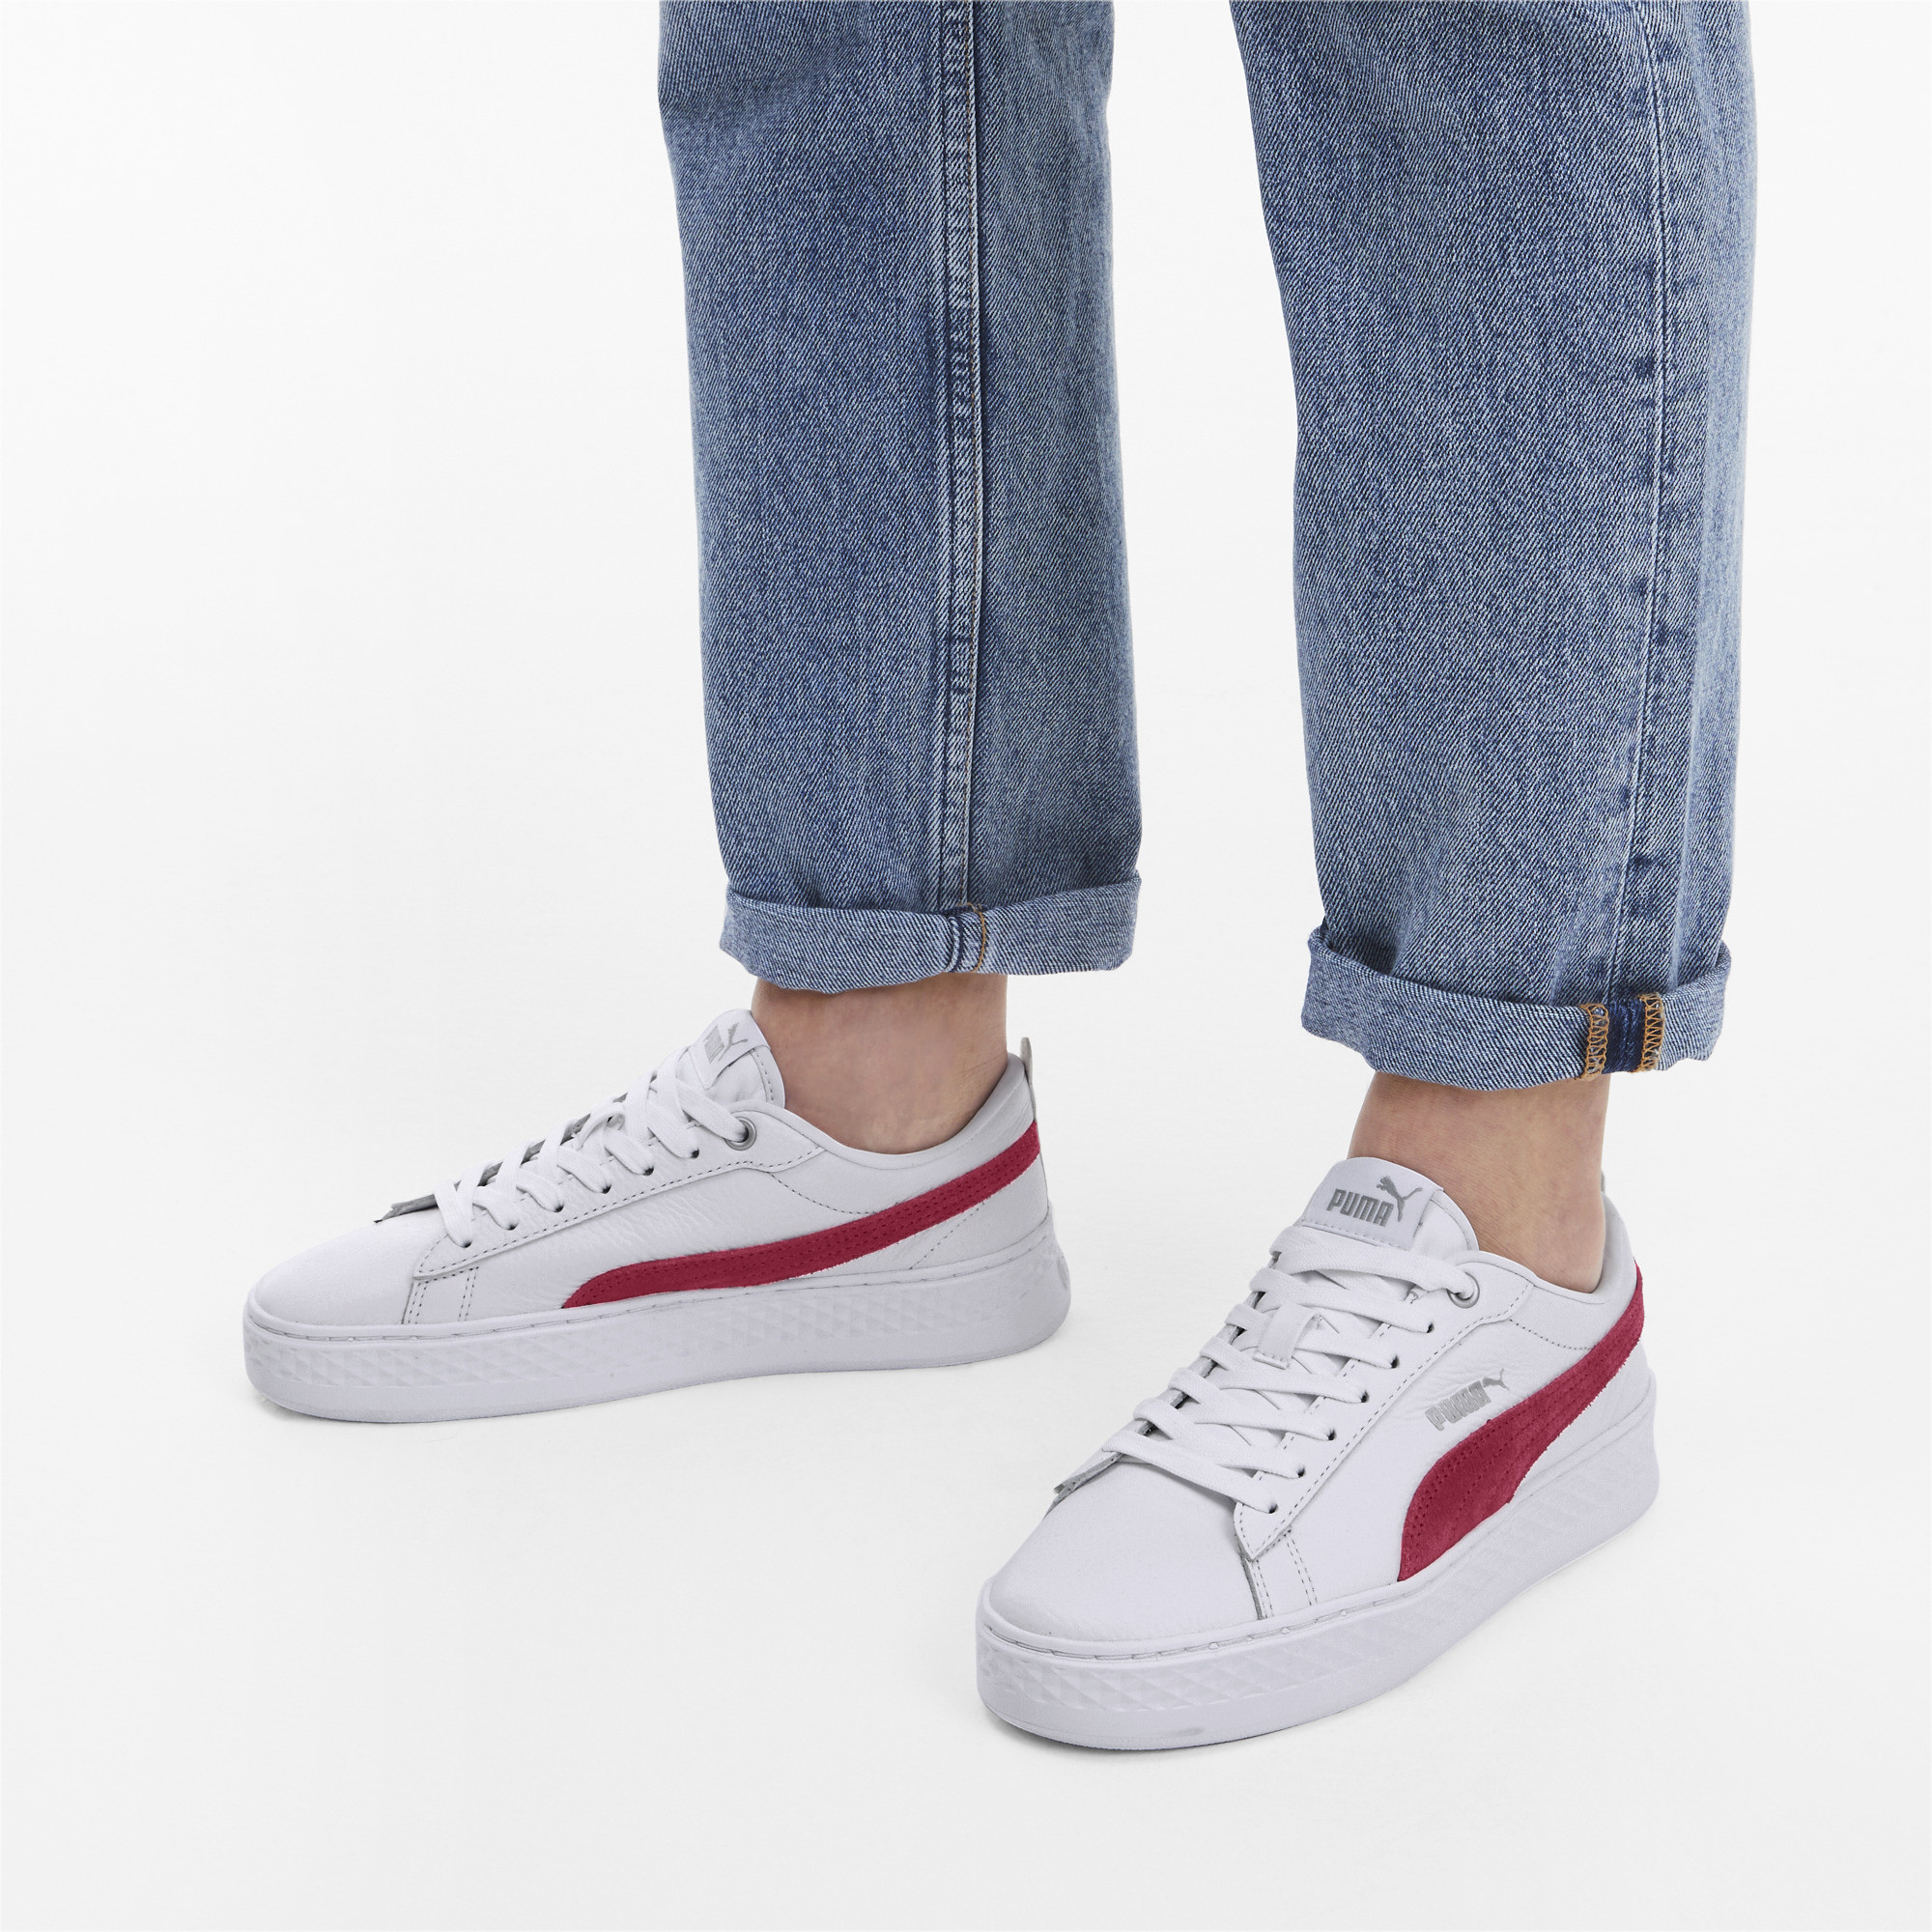 PUMA-Smash-Platform-Leather-Women-039-s-Sneakers-Women-Shoe-Basics thumbnail 10